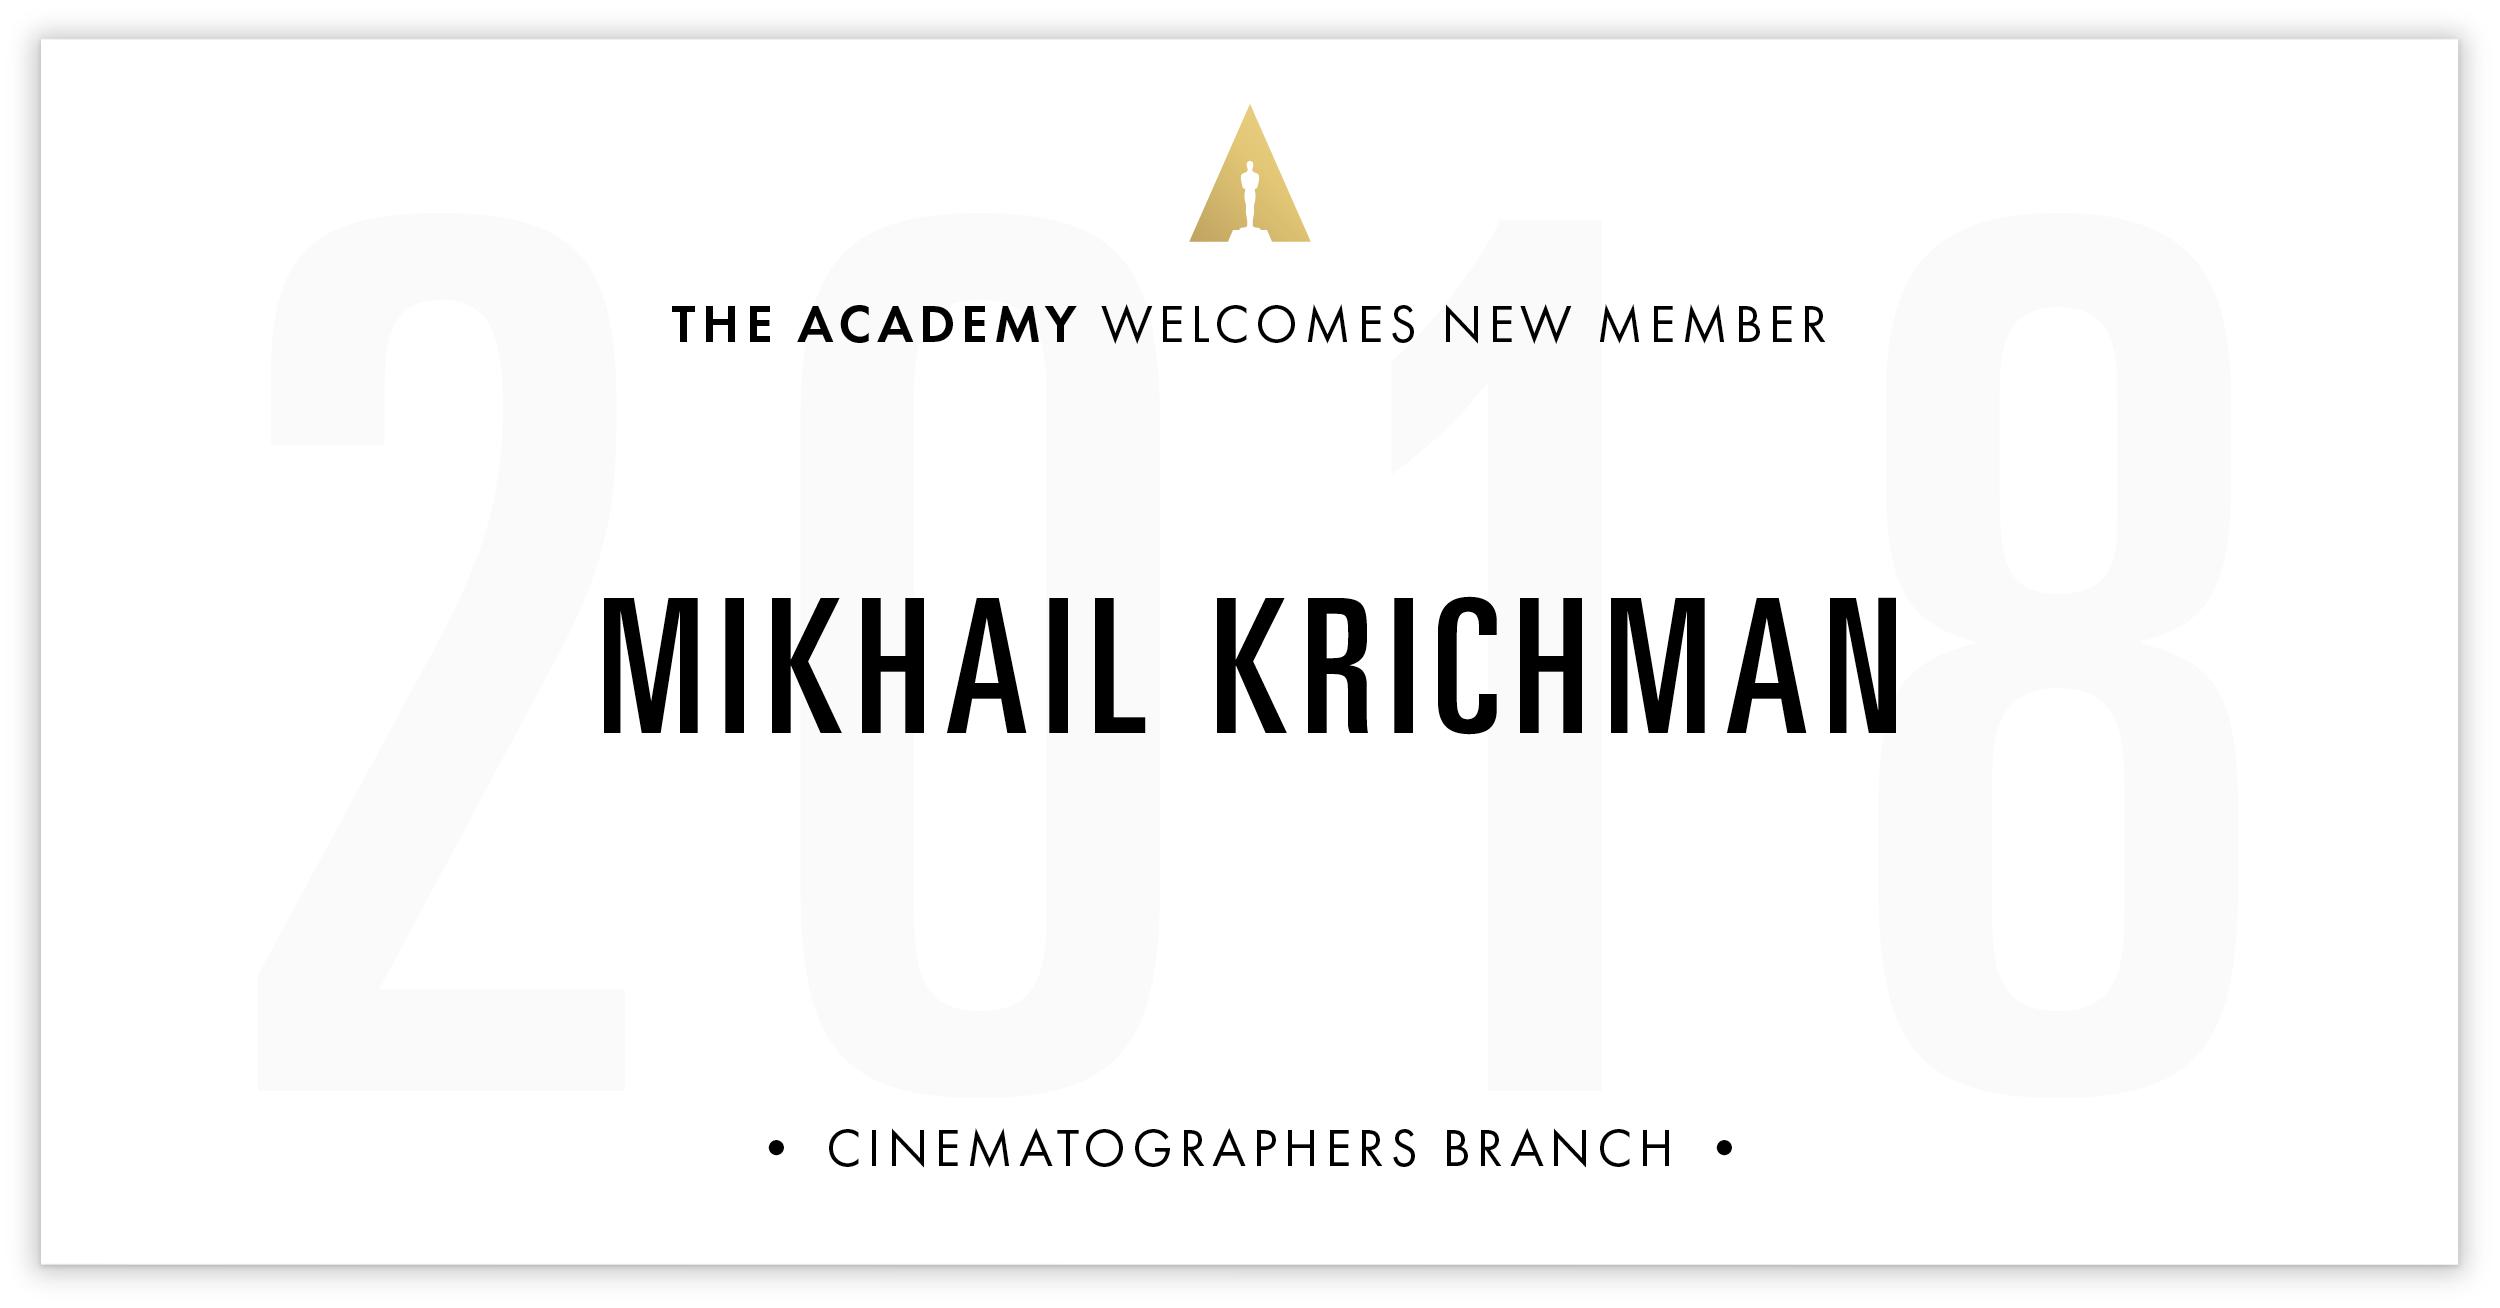 Mikhail Krichman is invited!